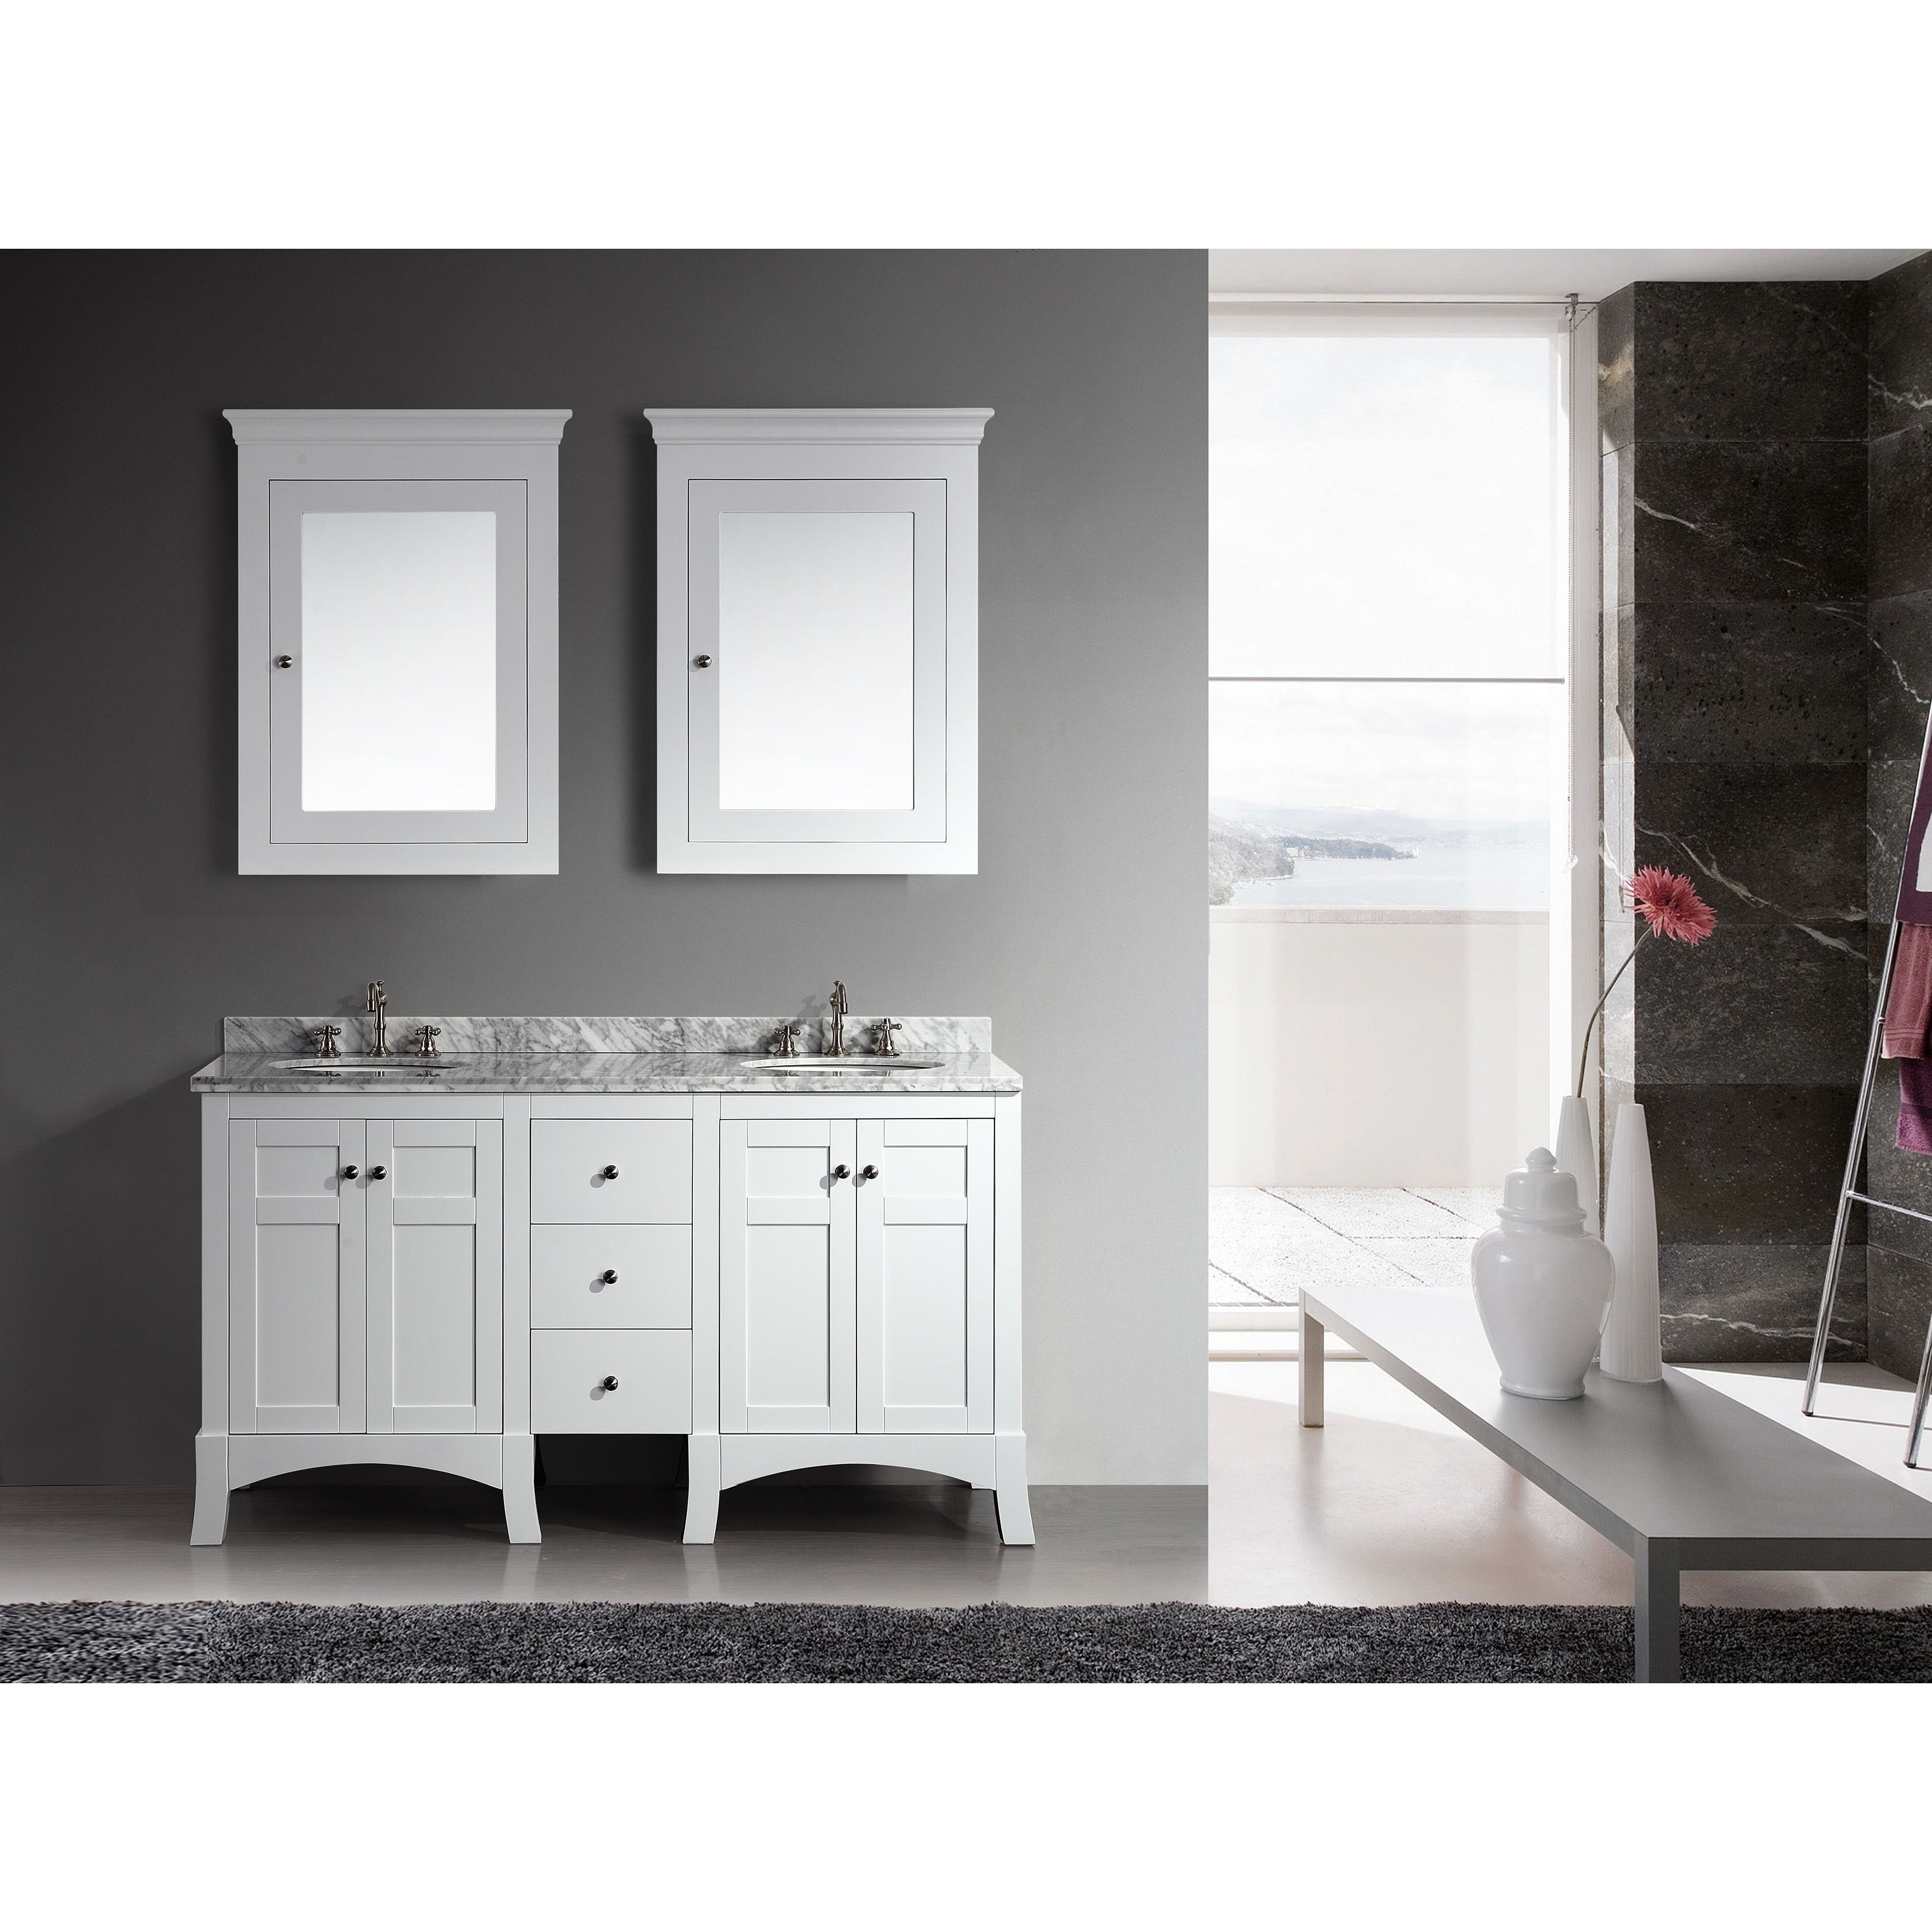 Double sink white bathroom vanities eviva hampton inch white bathroom vanity set with white carrera